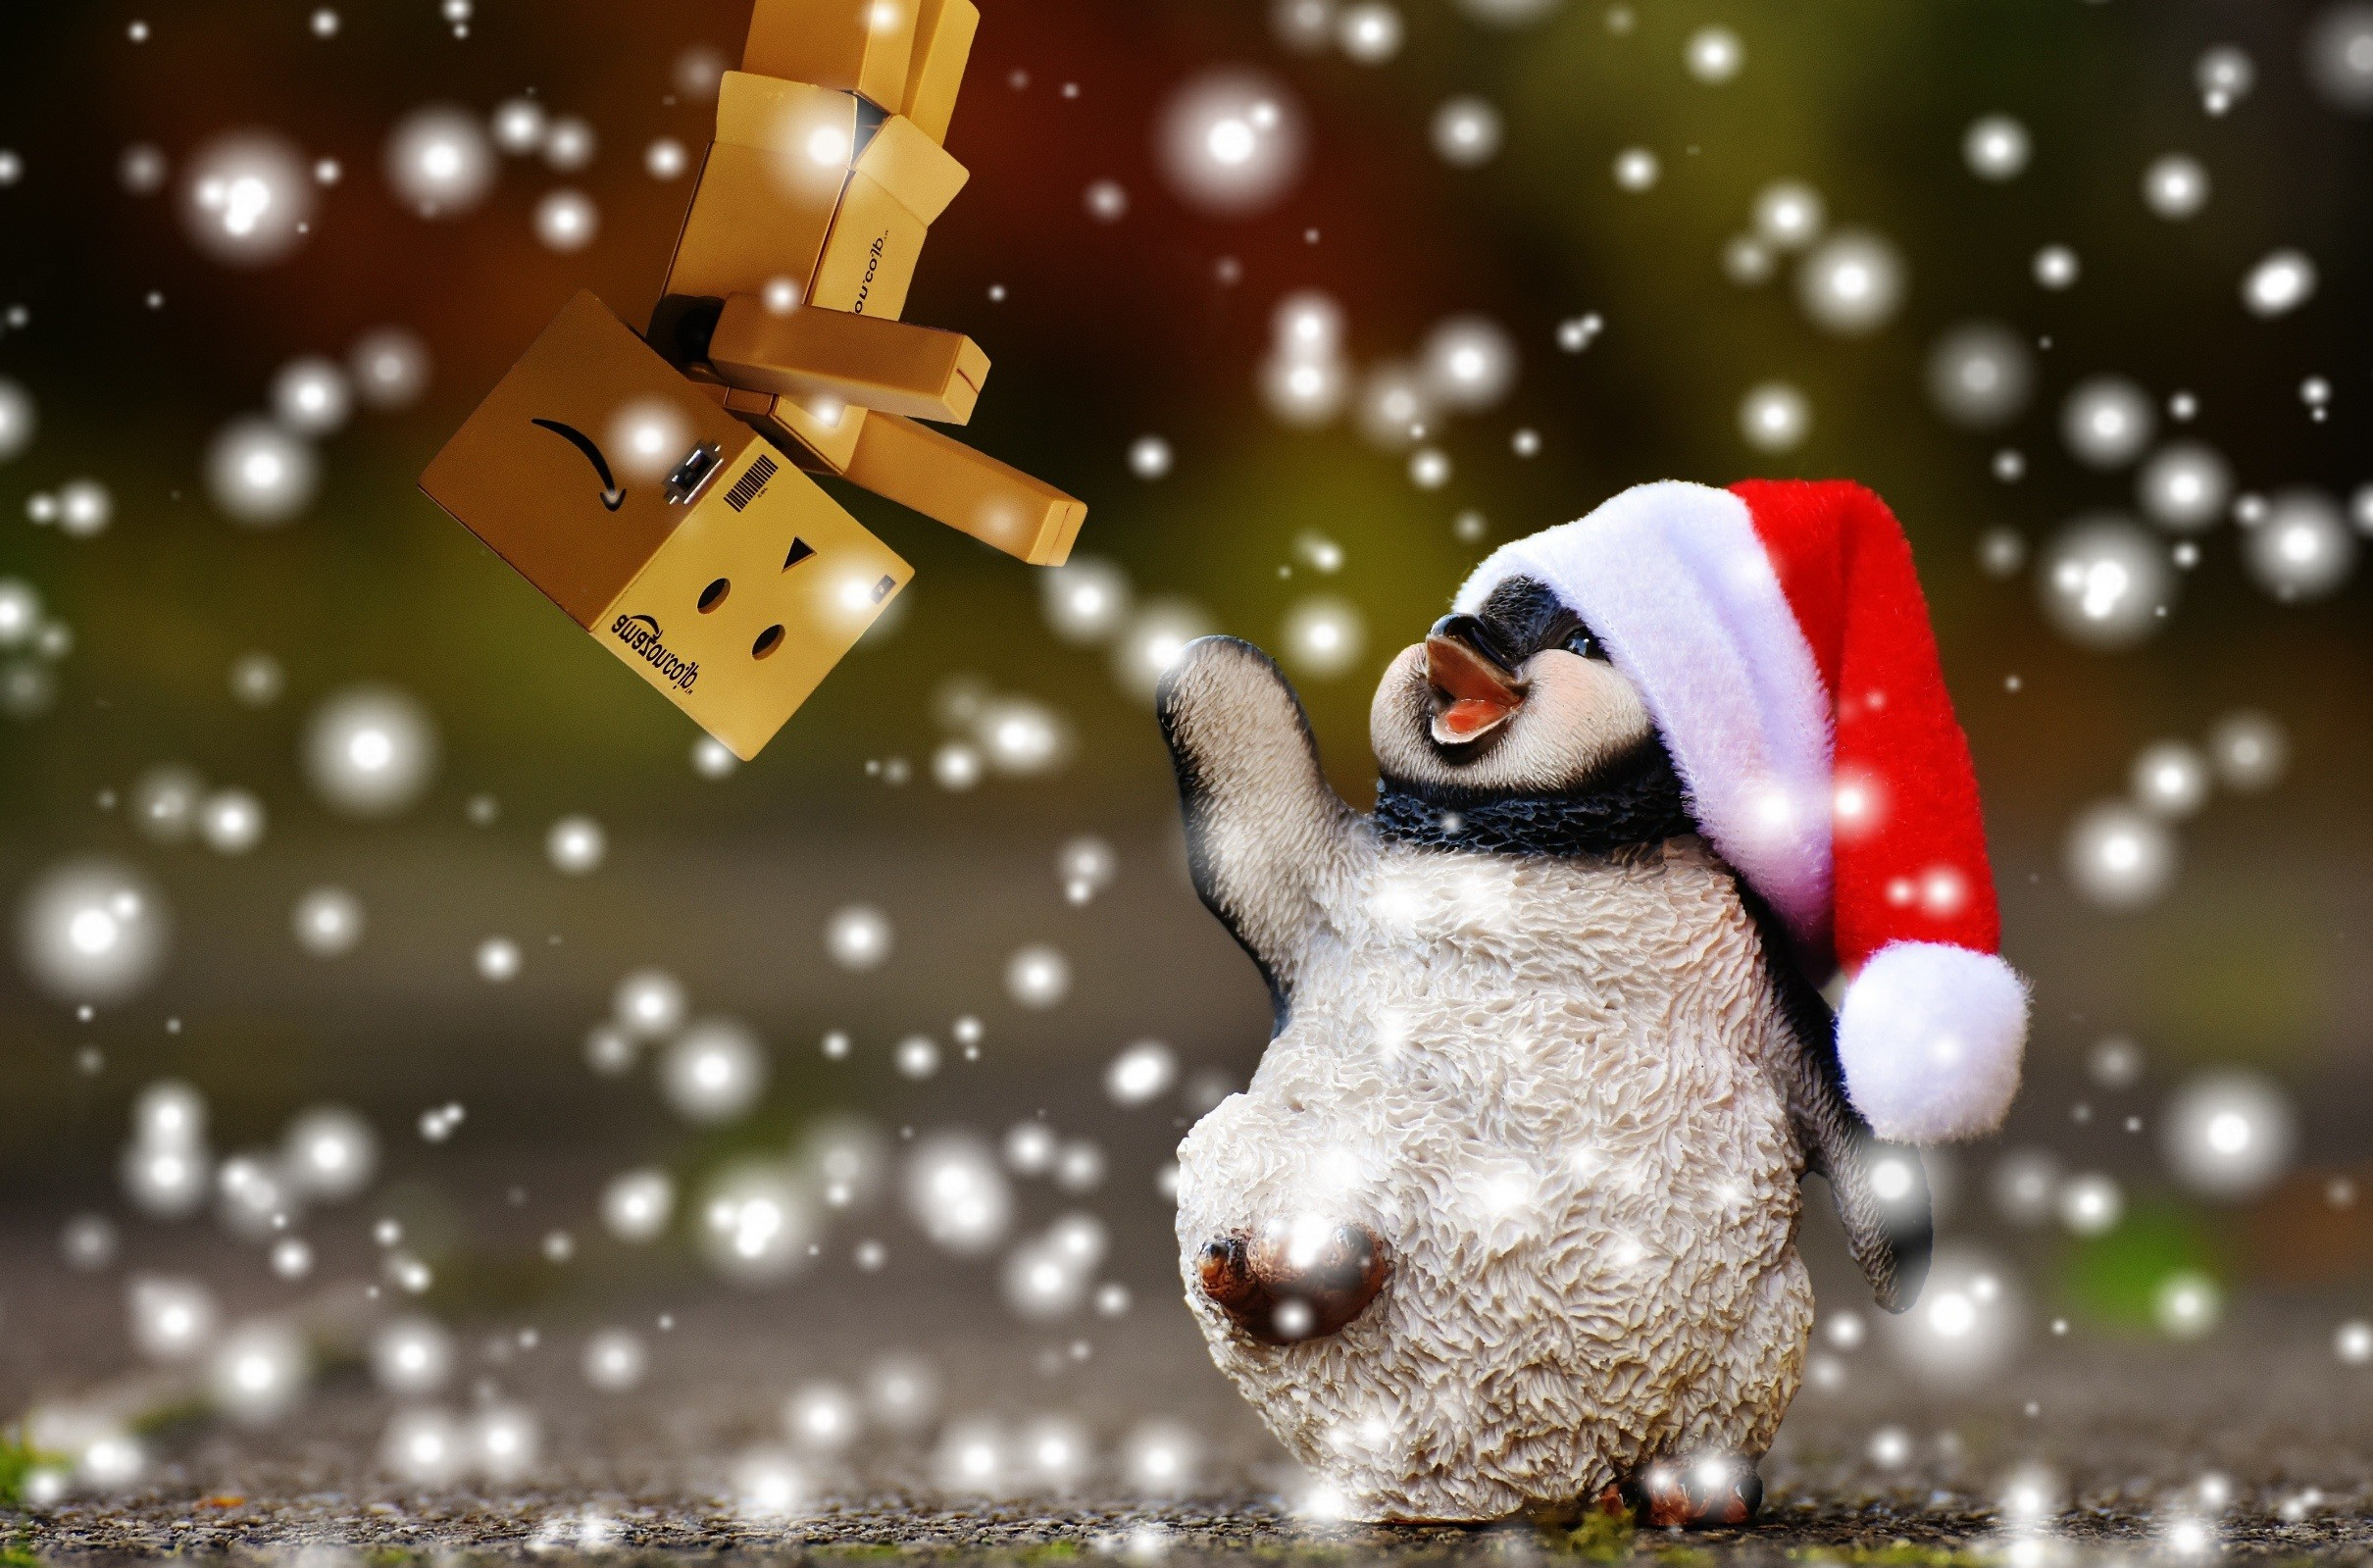 snow animal cute decoration ceramic holiday christmas christmas tree  penguin christmas decoration santa hat fun figure